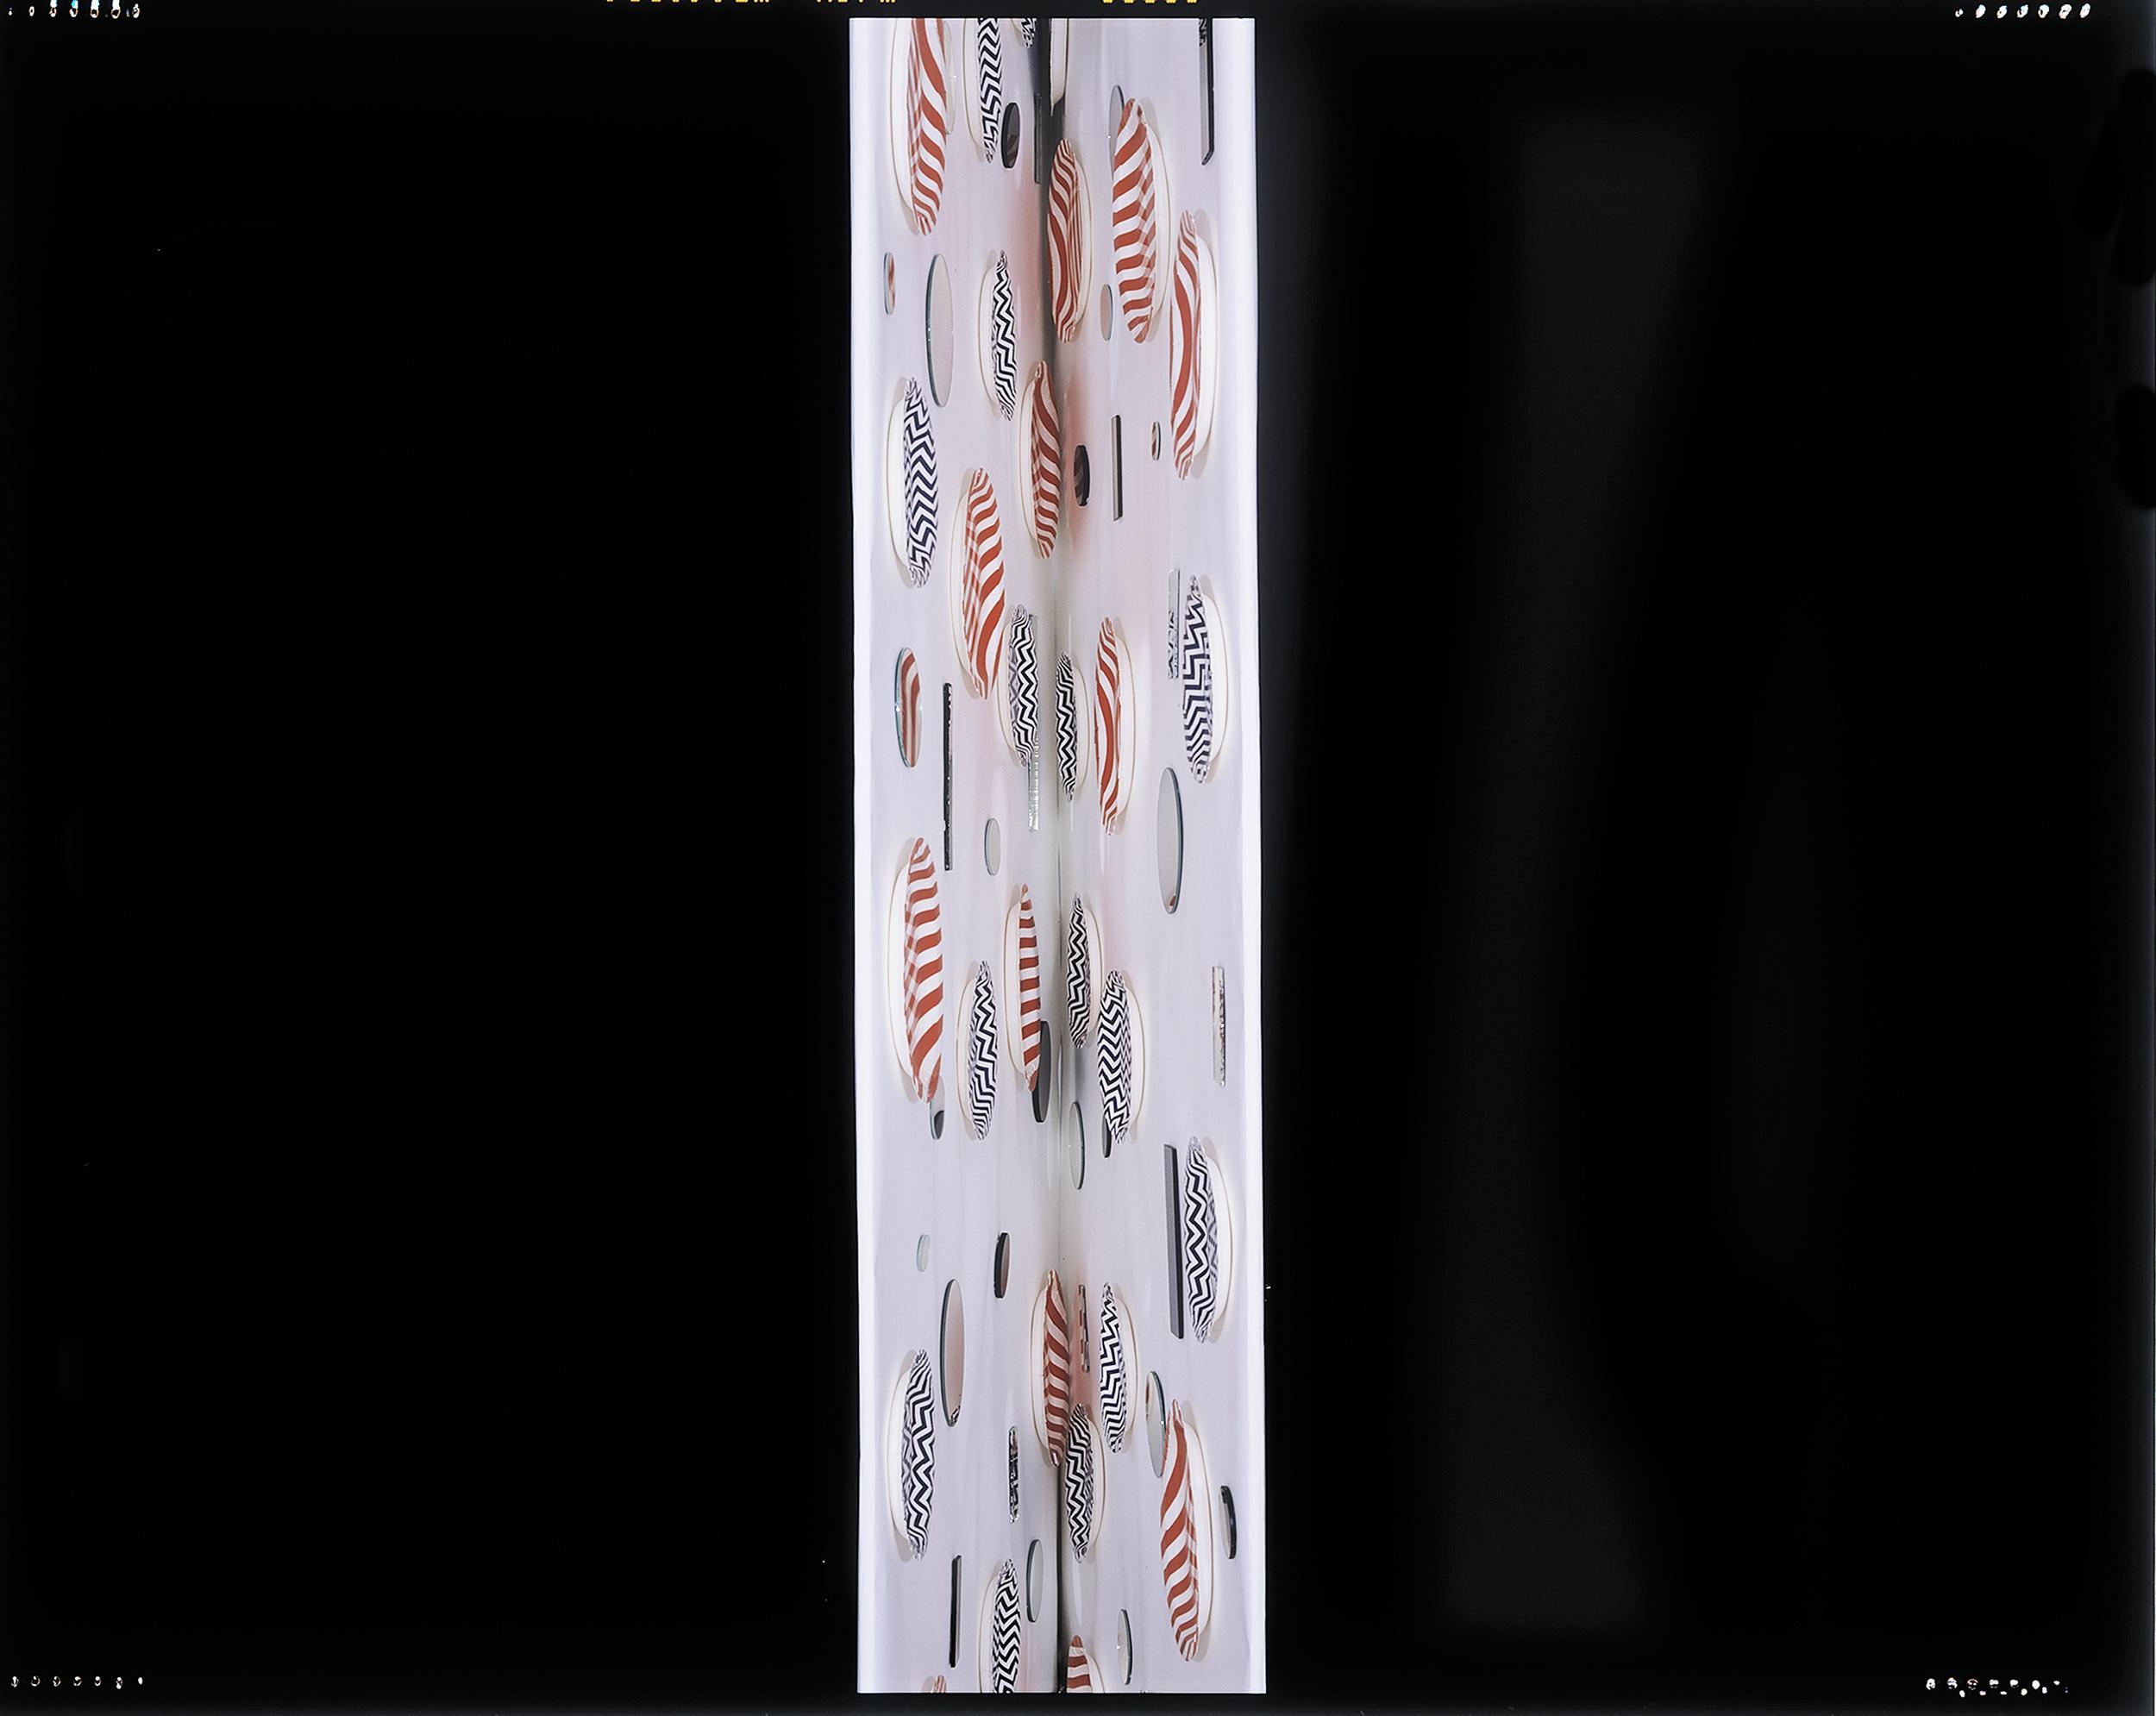 JACKY REDGATE   Light Throw (Mirrors) Fold #1   2014-15   chromogenic photograph   202 x 275.5 cm